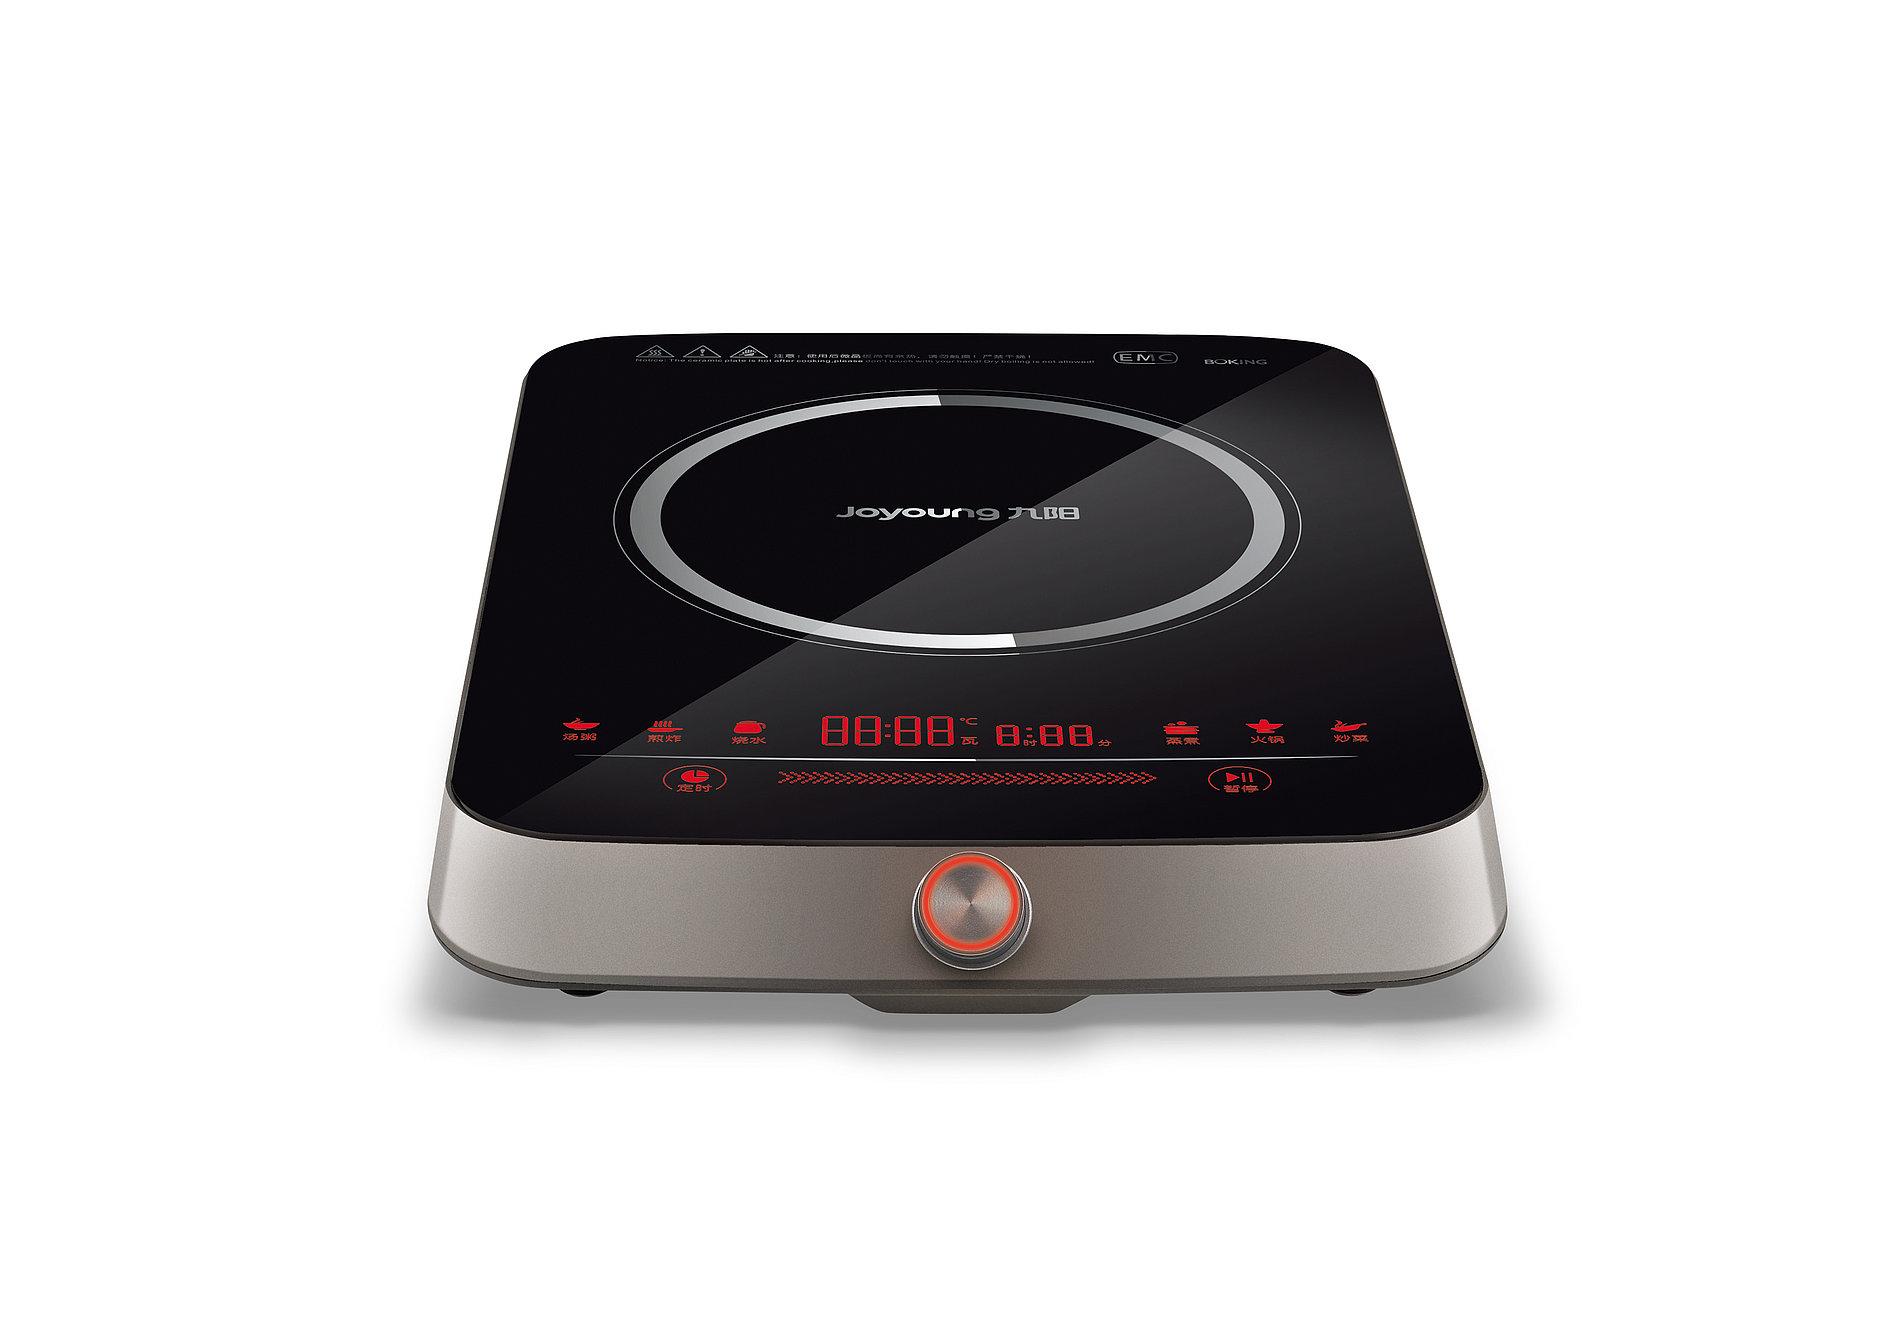 Holographic Electromagnetic Cooker | Red Dot Design Award